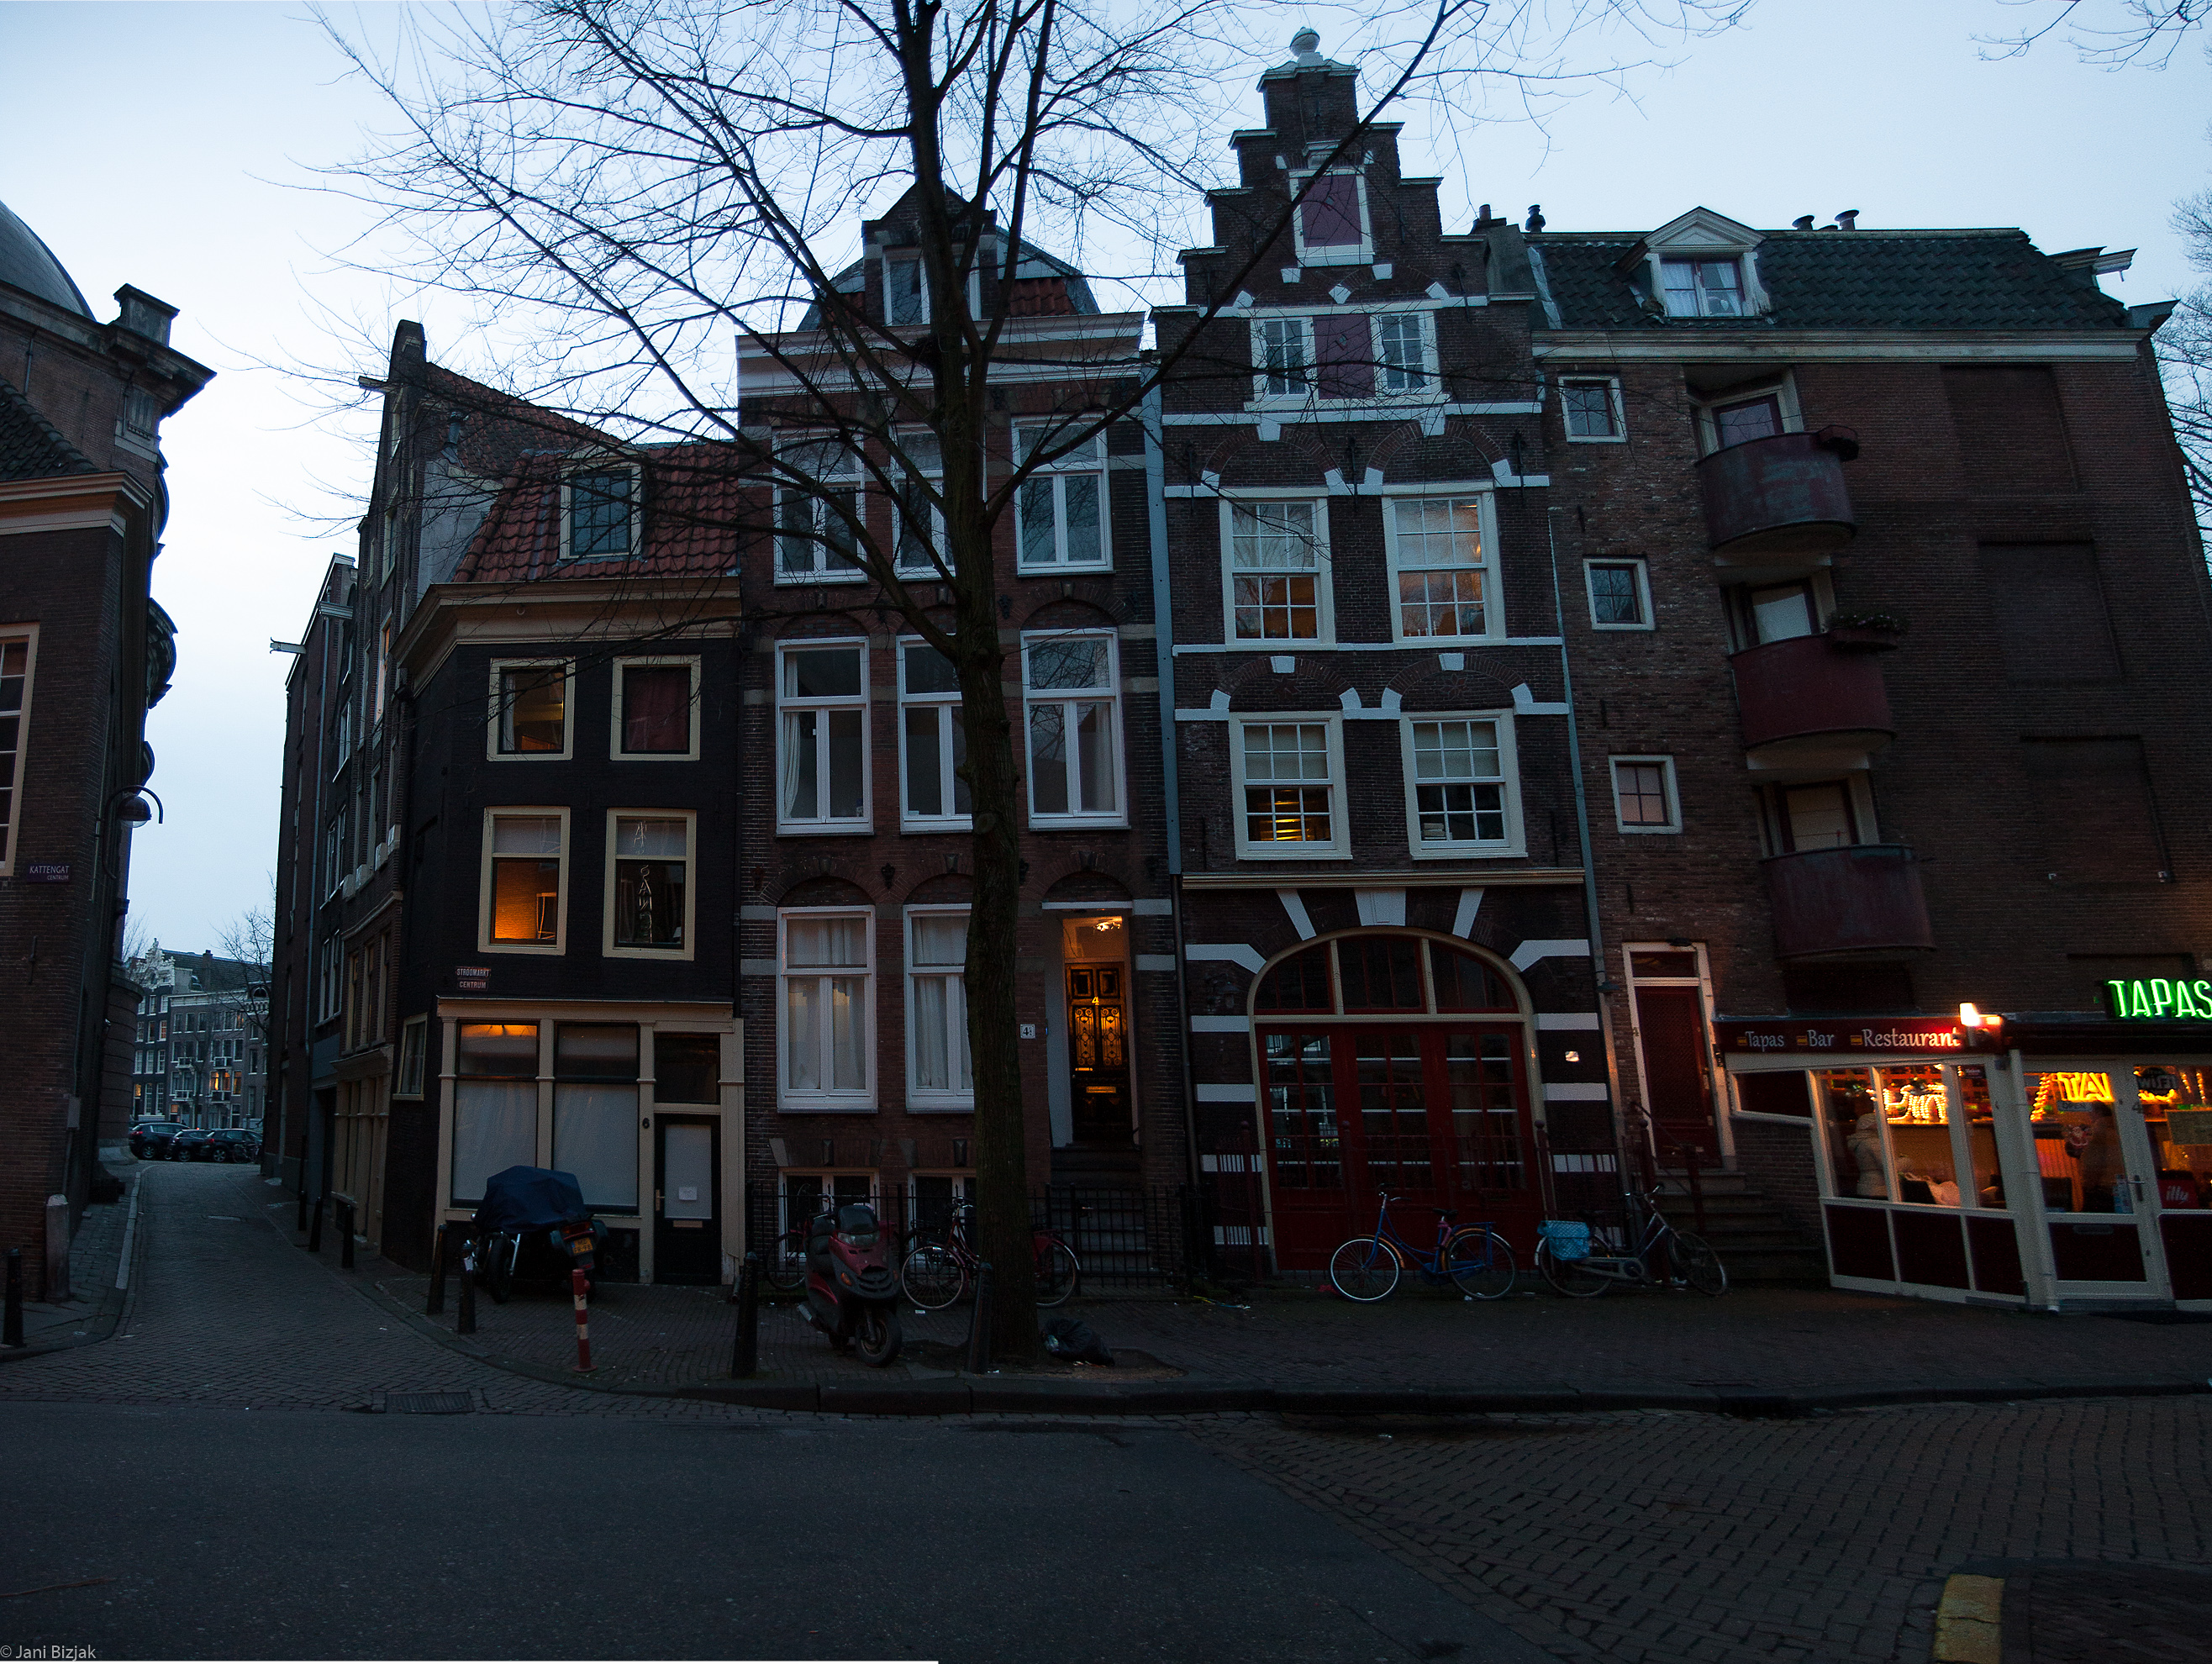 Narrow buildings.